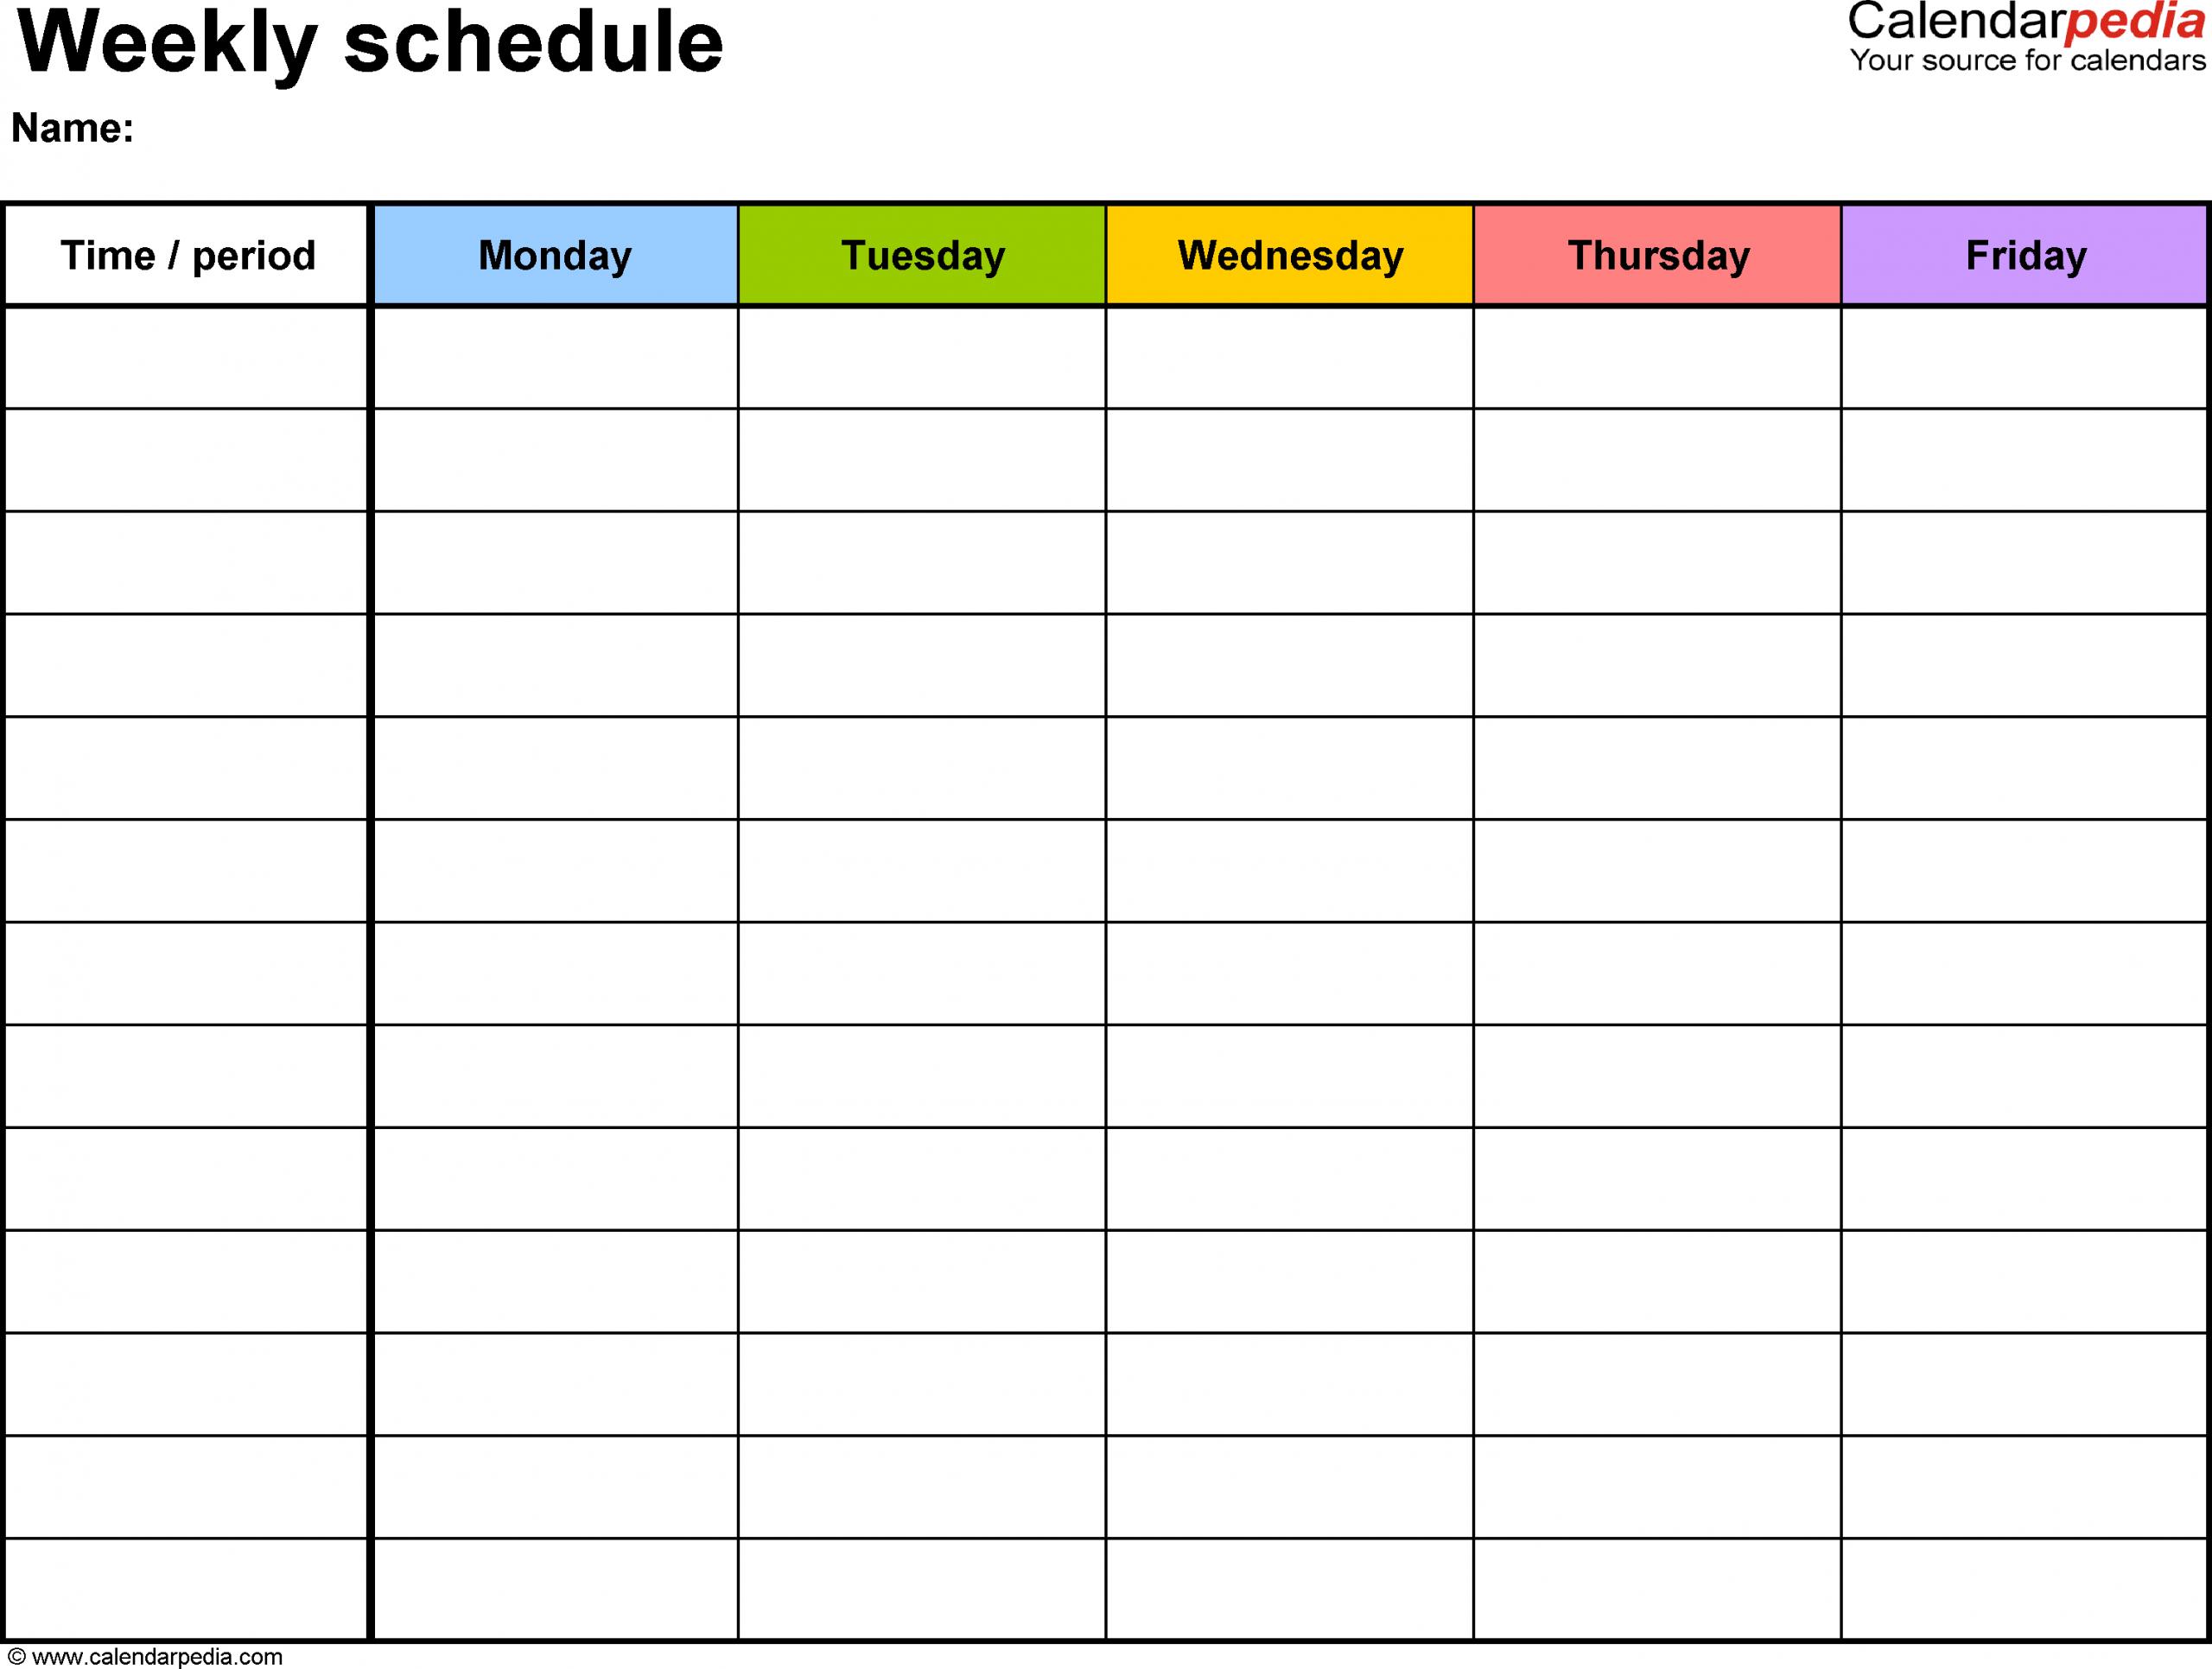 Weekly Schedule Template For Word Version 1: Landscape, 1 Sprint Days Calendar Excel